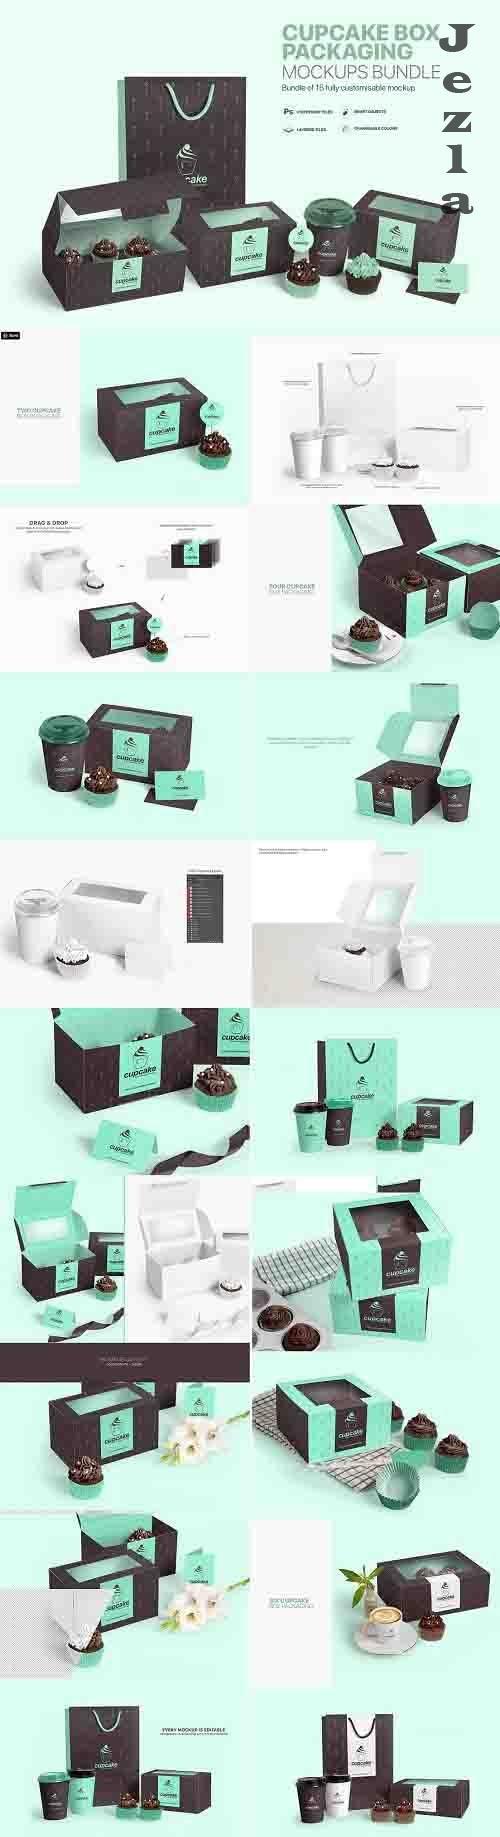 Cupcake Box Packaging Mockups Bundle - 758072